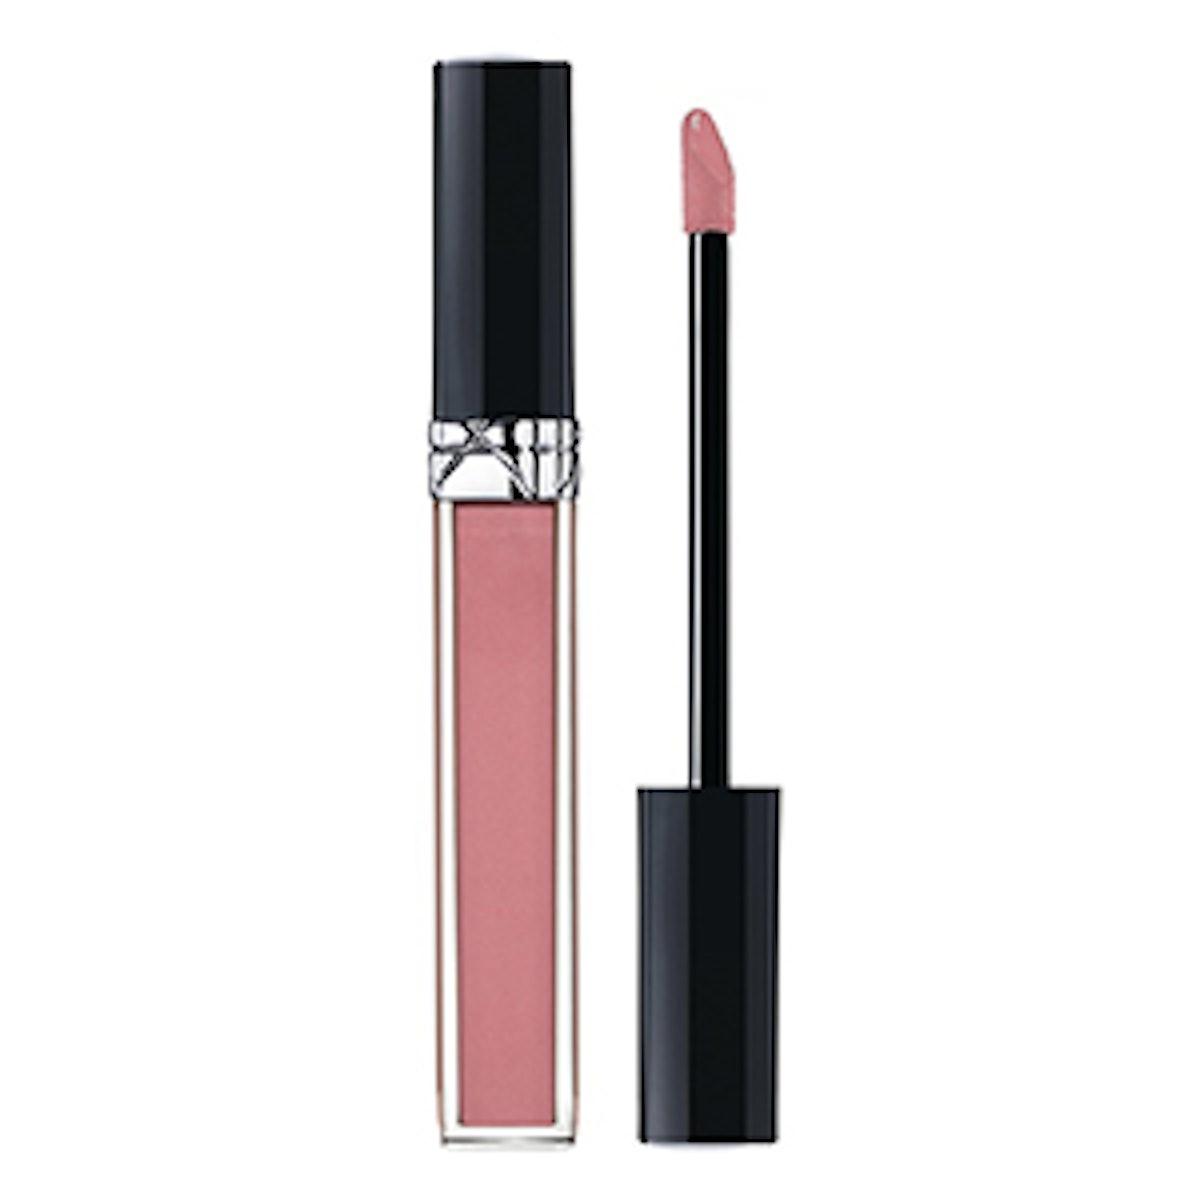 Rouge Dior Brilliant Lipshine